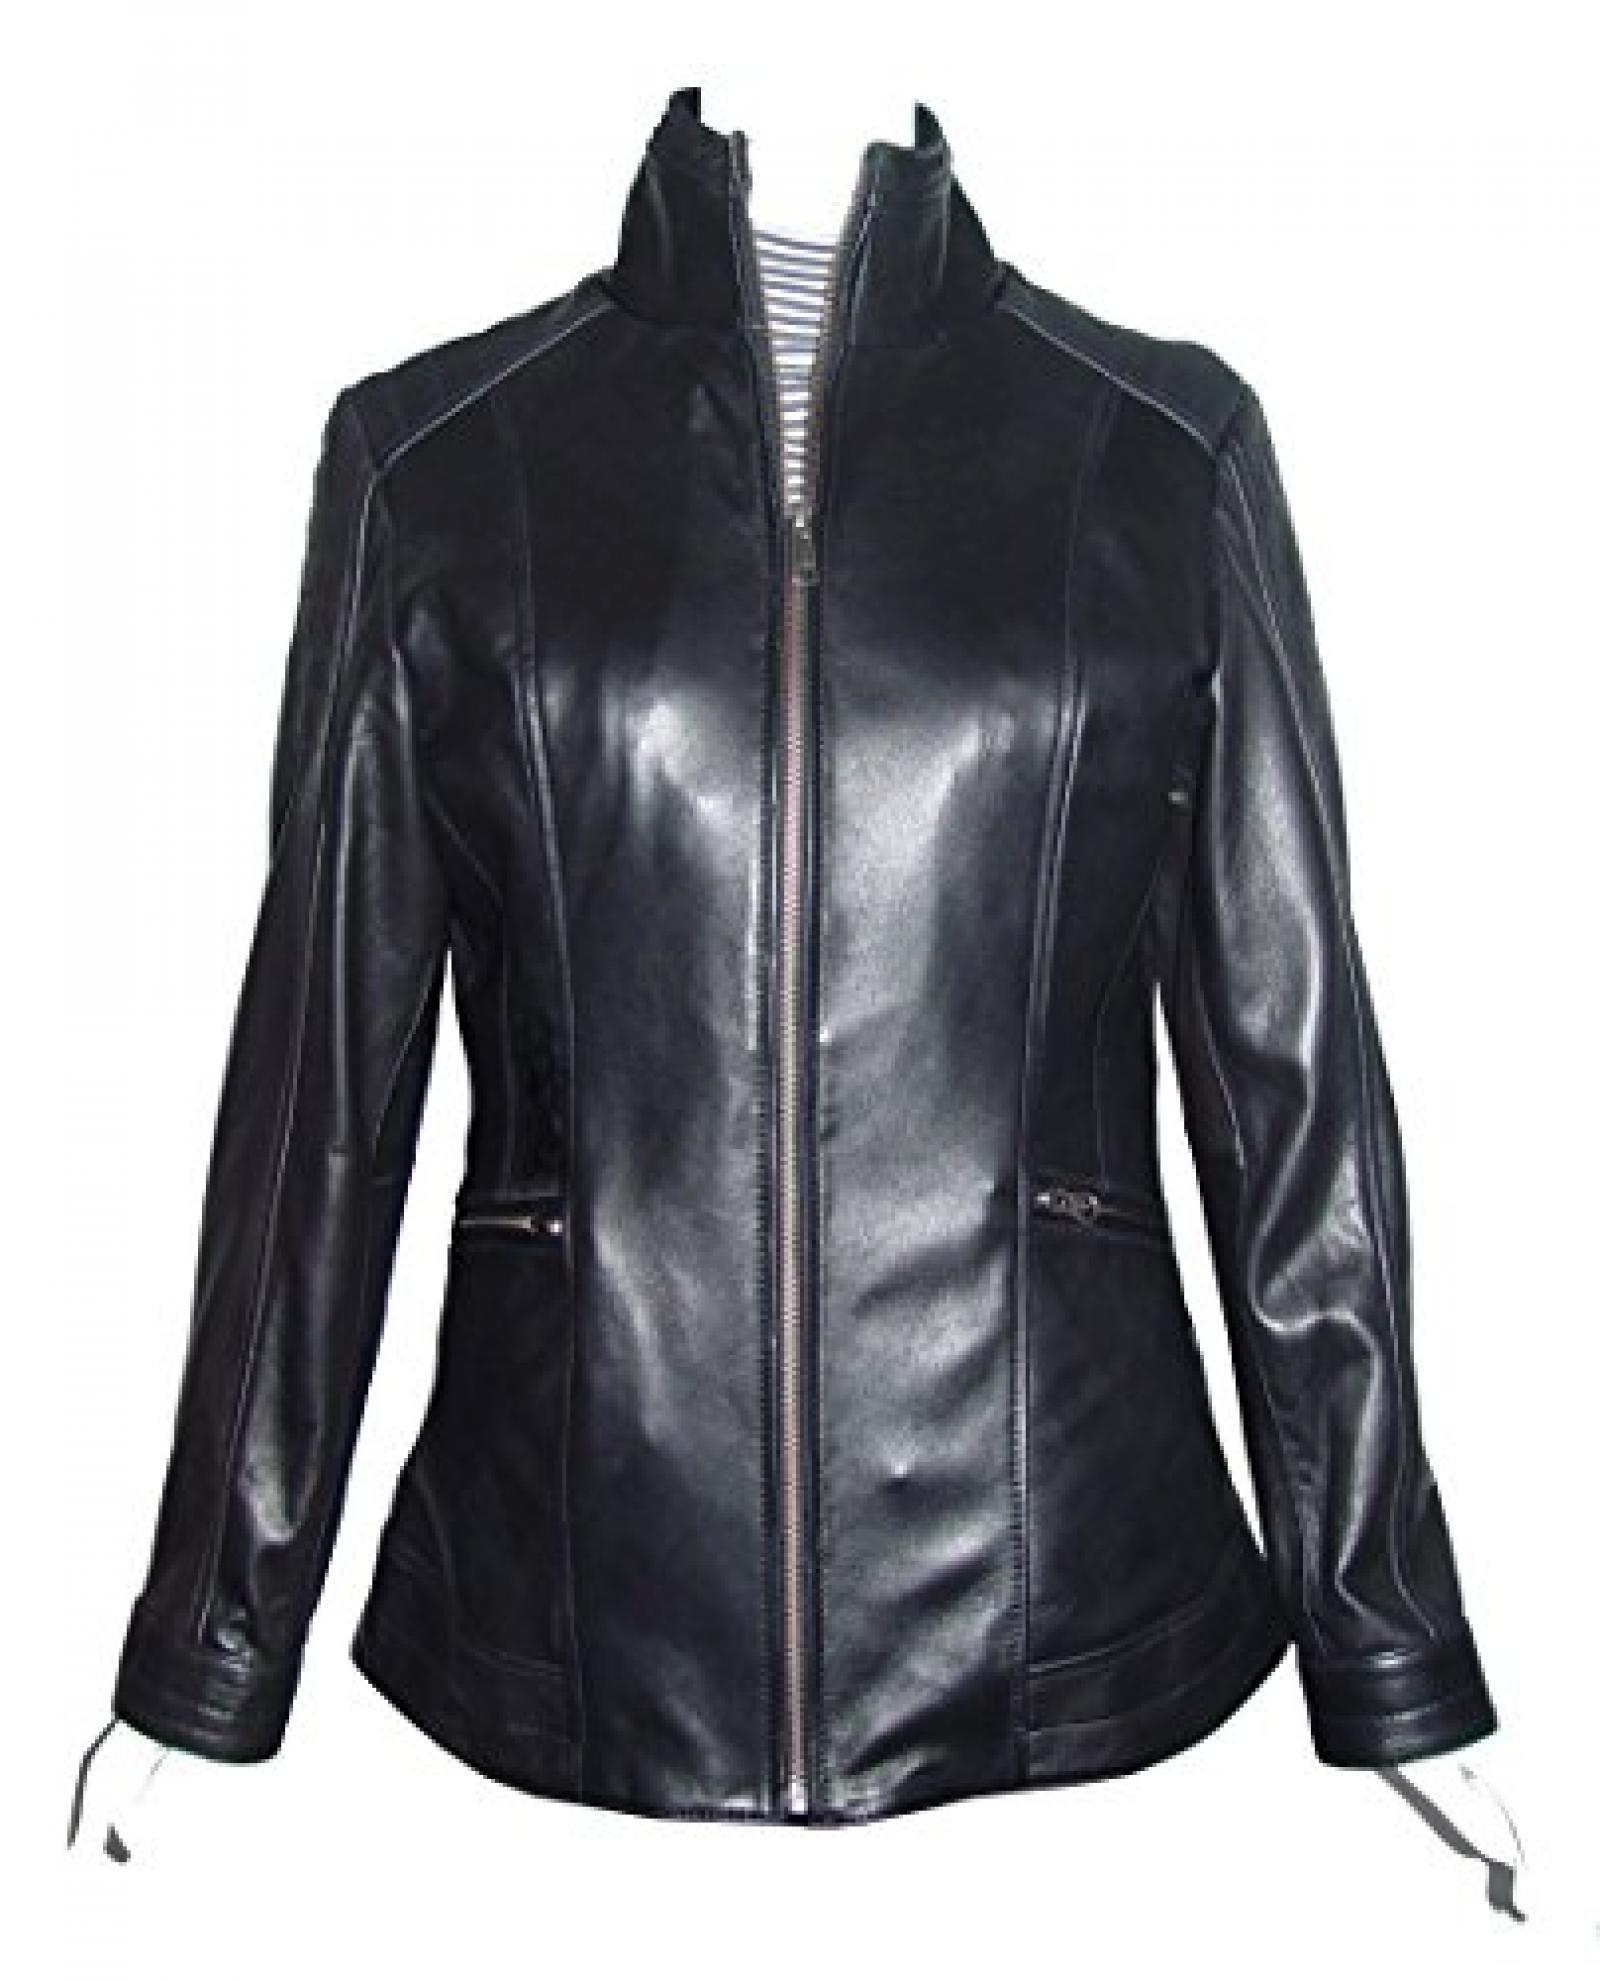 Nettailor Women PETITE SZ 4189 Soft Leather Simple Easy Rider Jacket Long